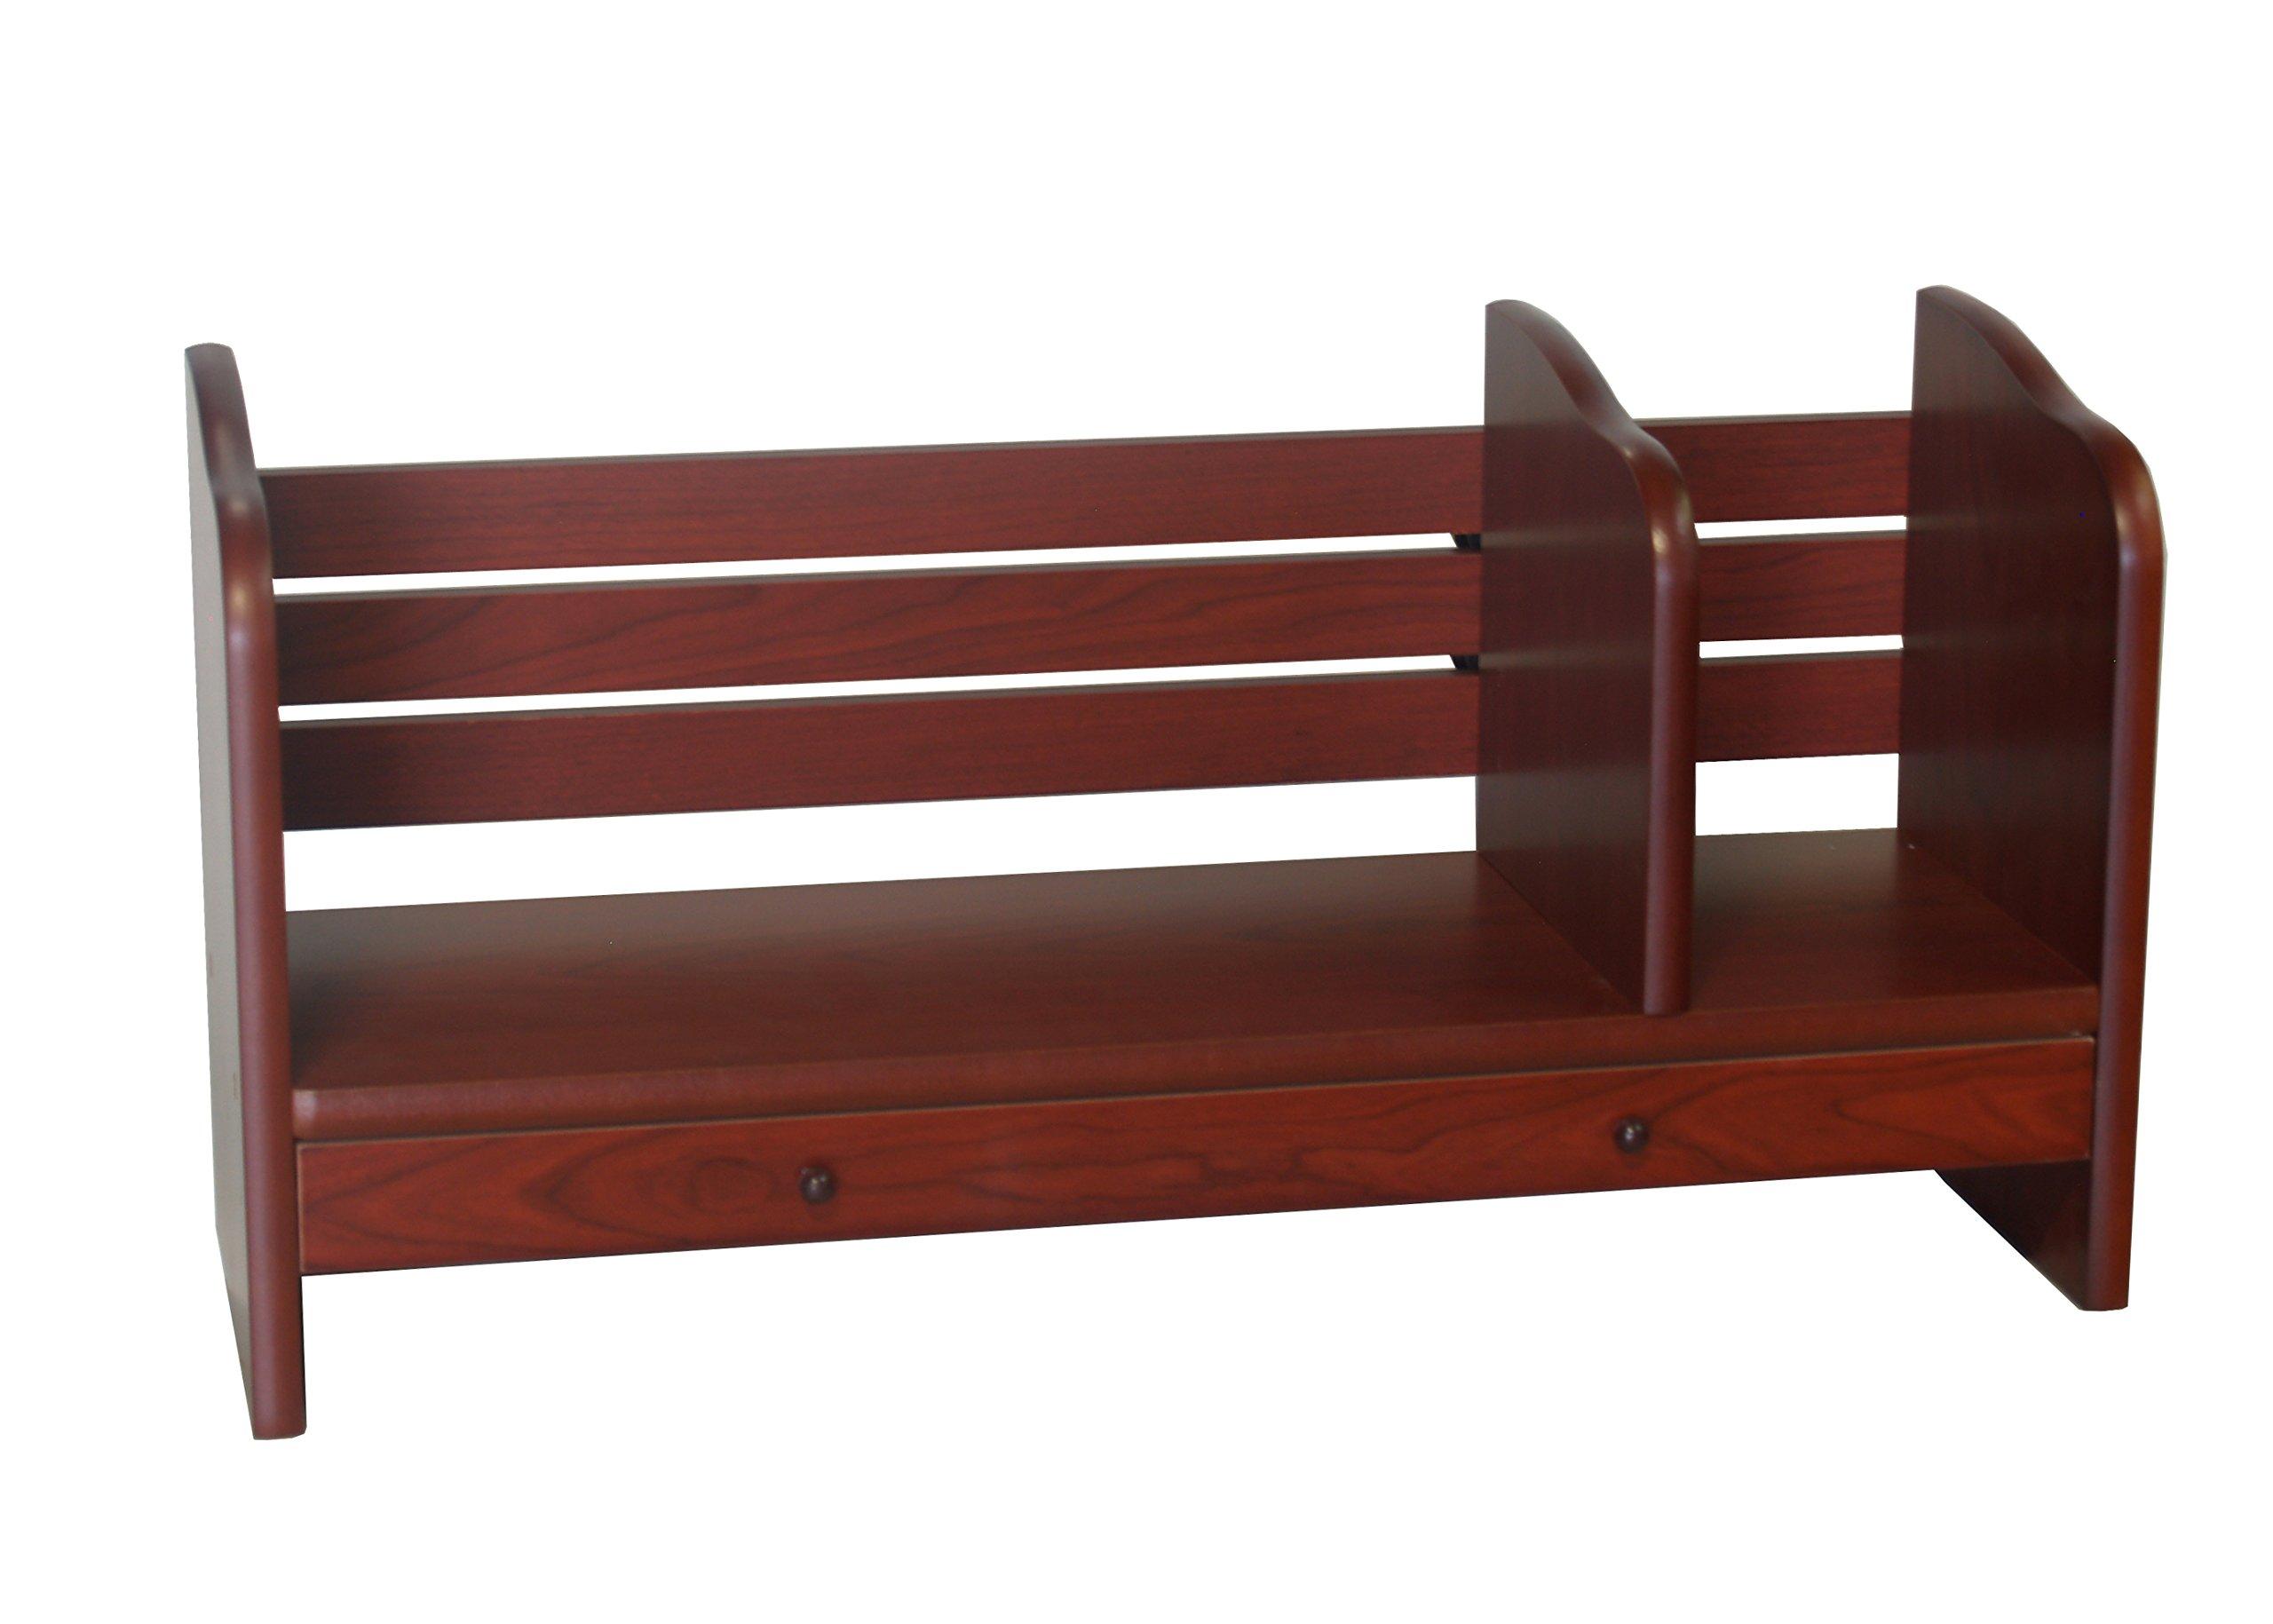 Proman Products Renaissance Desktop Red Walnut Wood Book Rack Adjustable with Drawer, 24'' W x 8'' D x 12'' H, Reddish